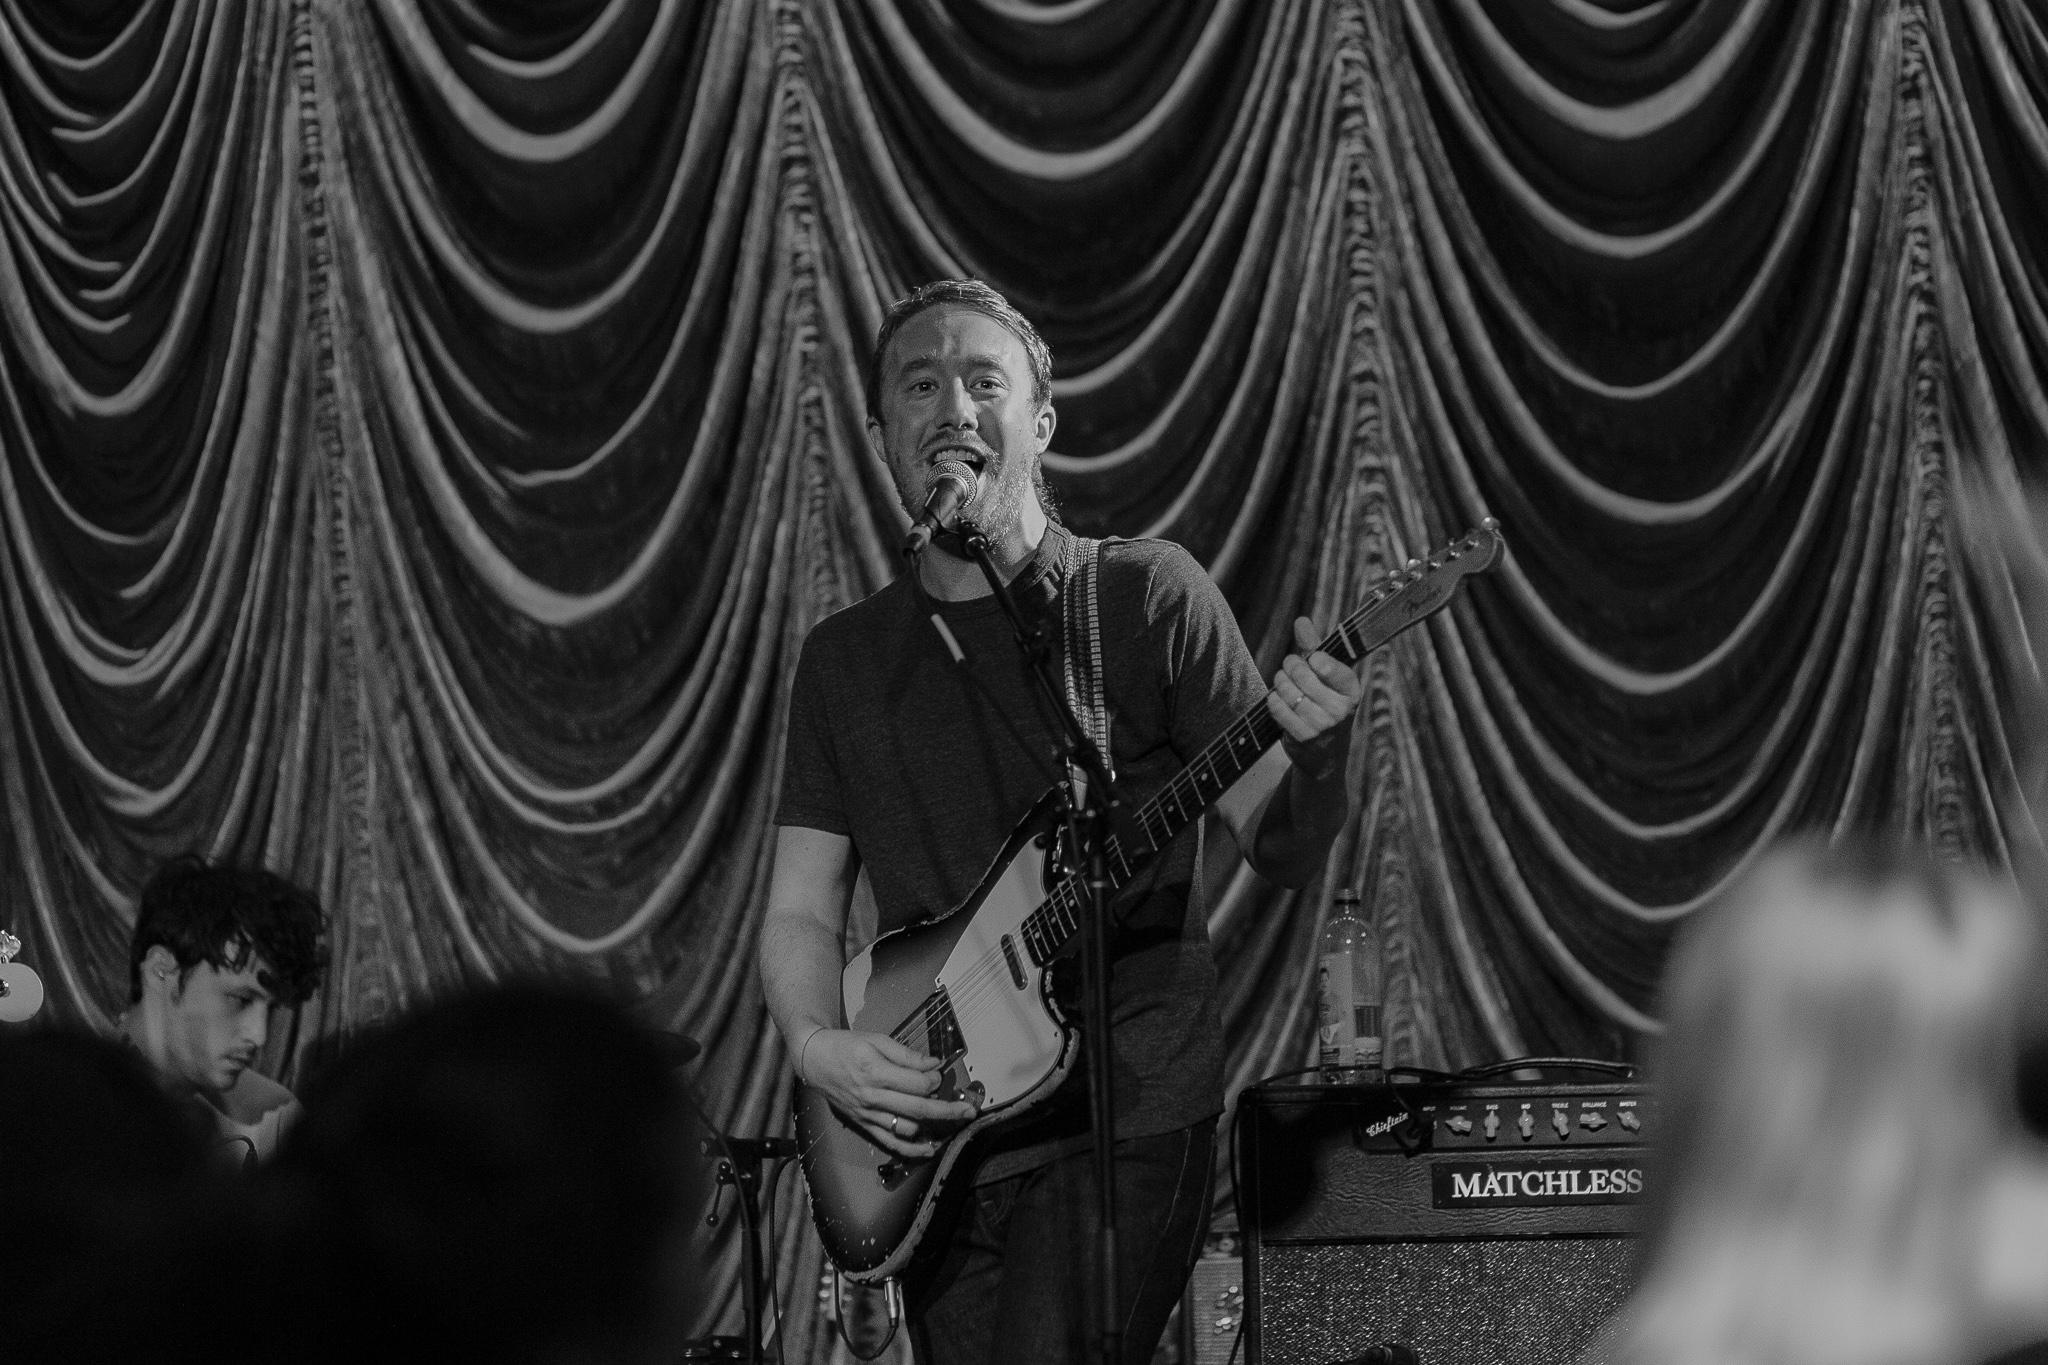 Wilderado perform at The Foundry in Philadelphia, PA. Shot by Nicole DiBenedetto - https://www.nicoledibphotography.com/ - for Sound Bites Media.